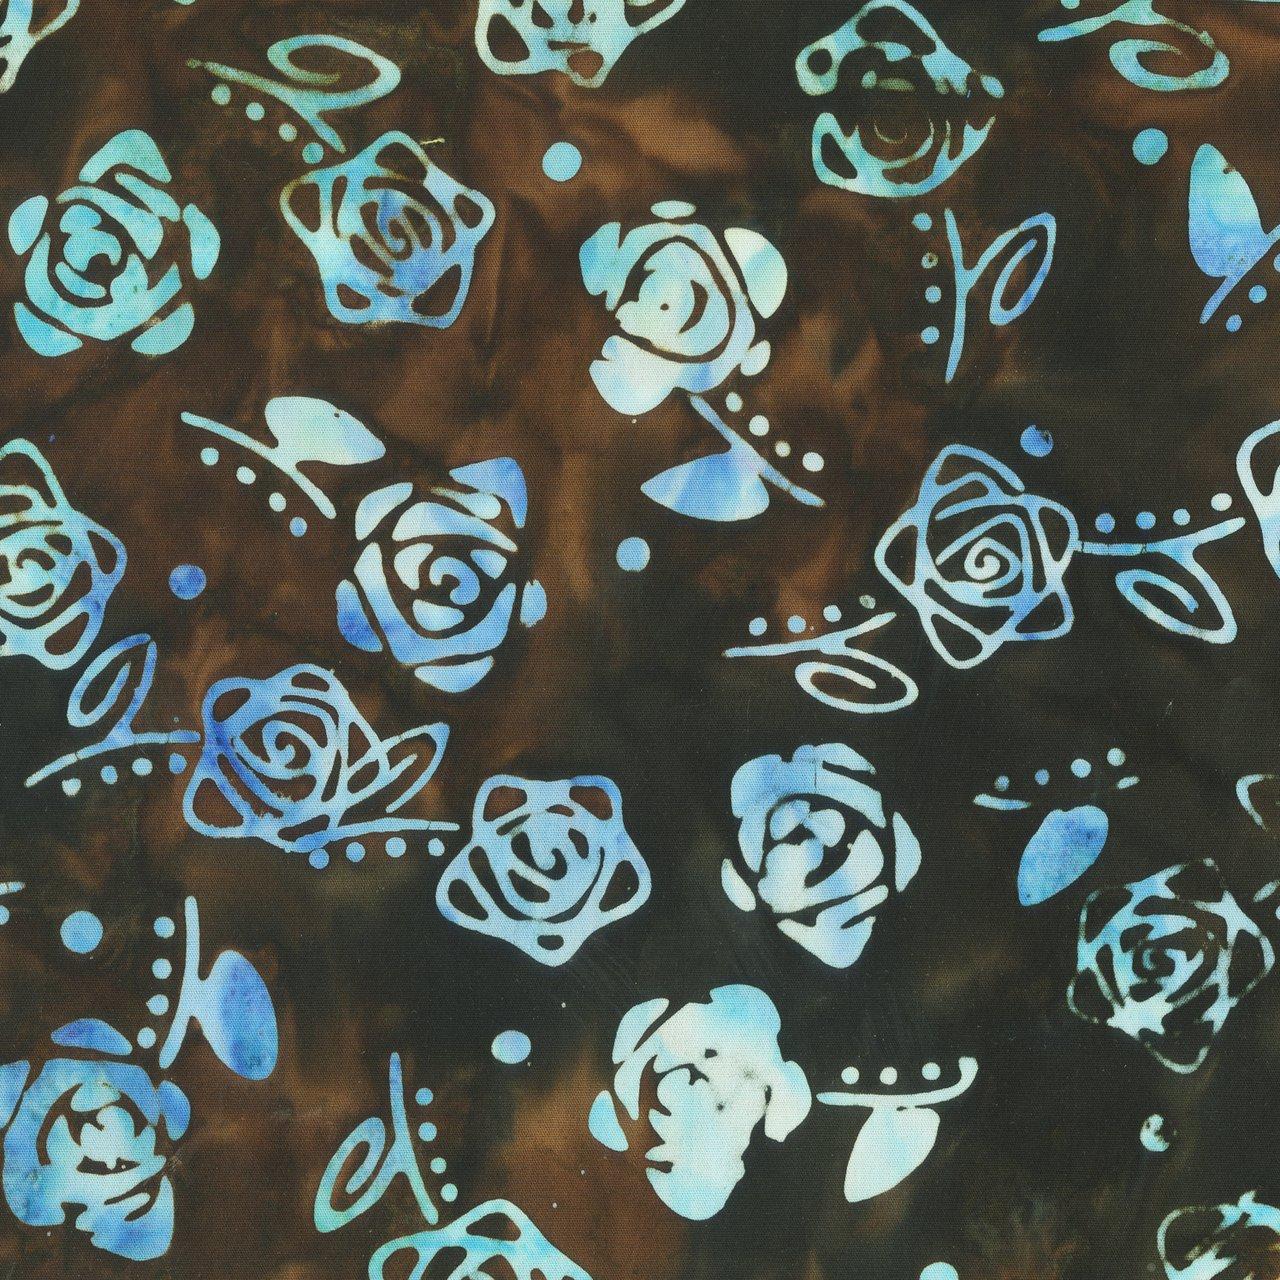 2016Q-4 Art Inspired: Dreamland by Alice Pike Barney